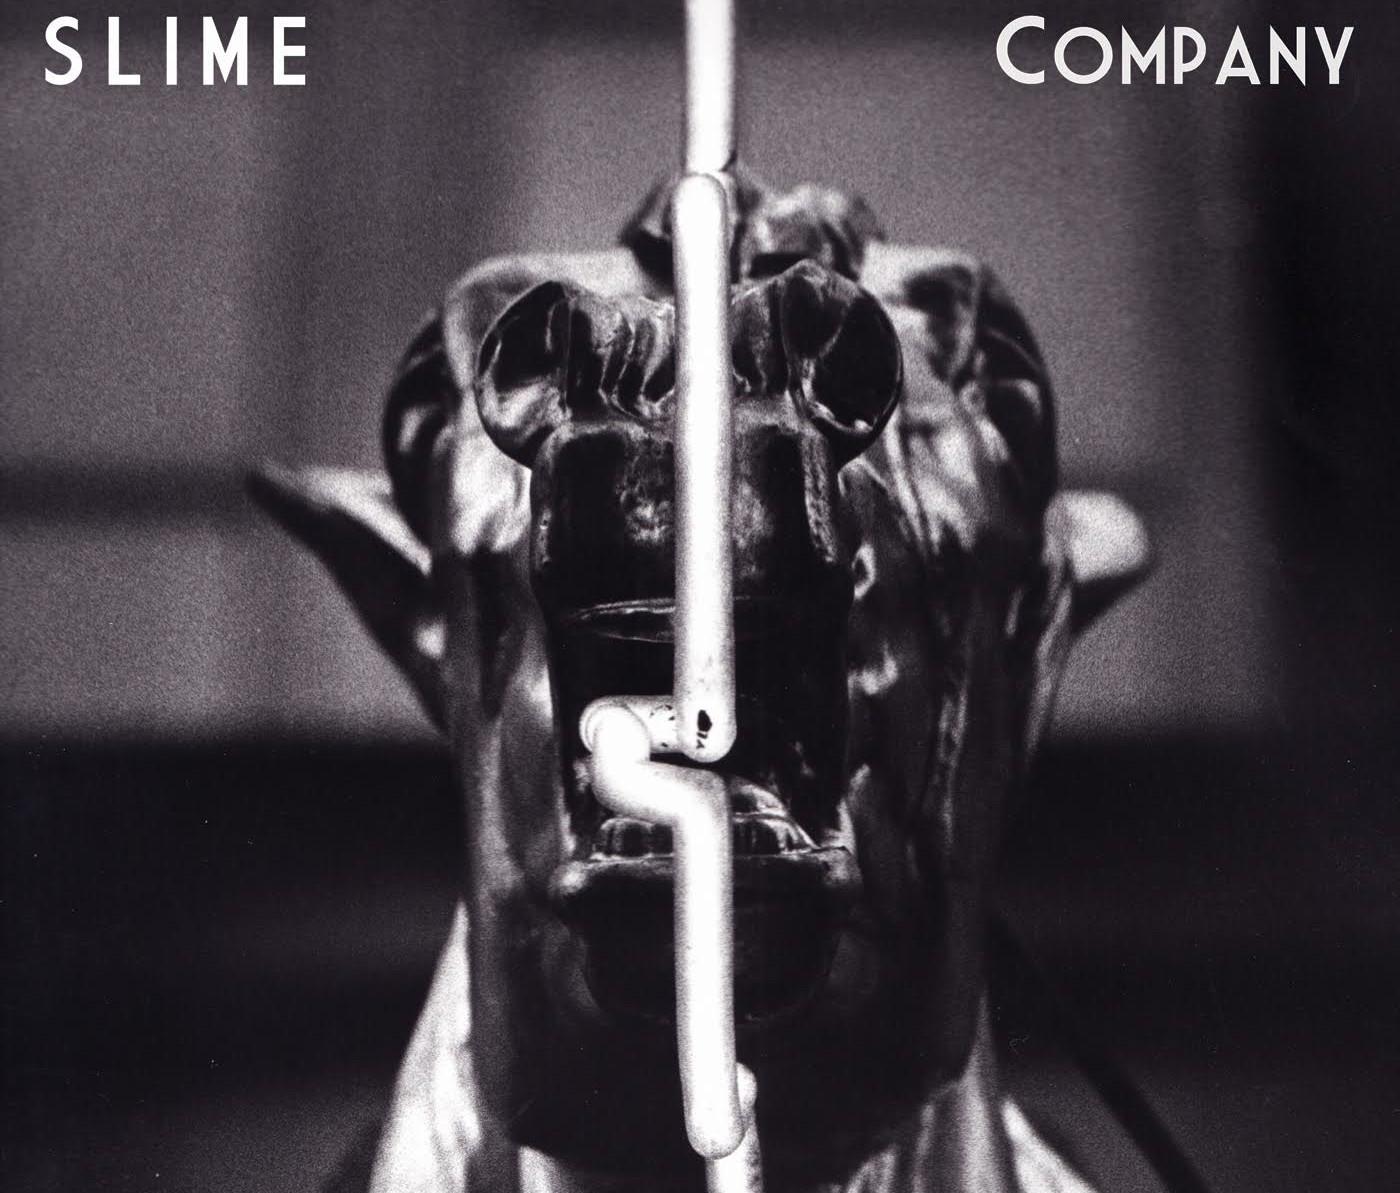 Slime Streams Debut Album Company